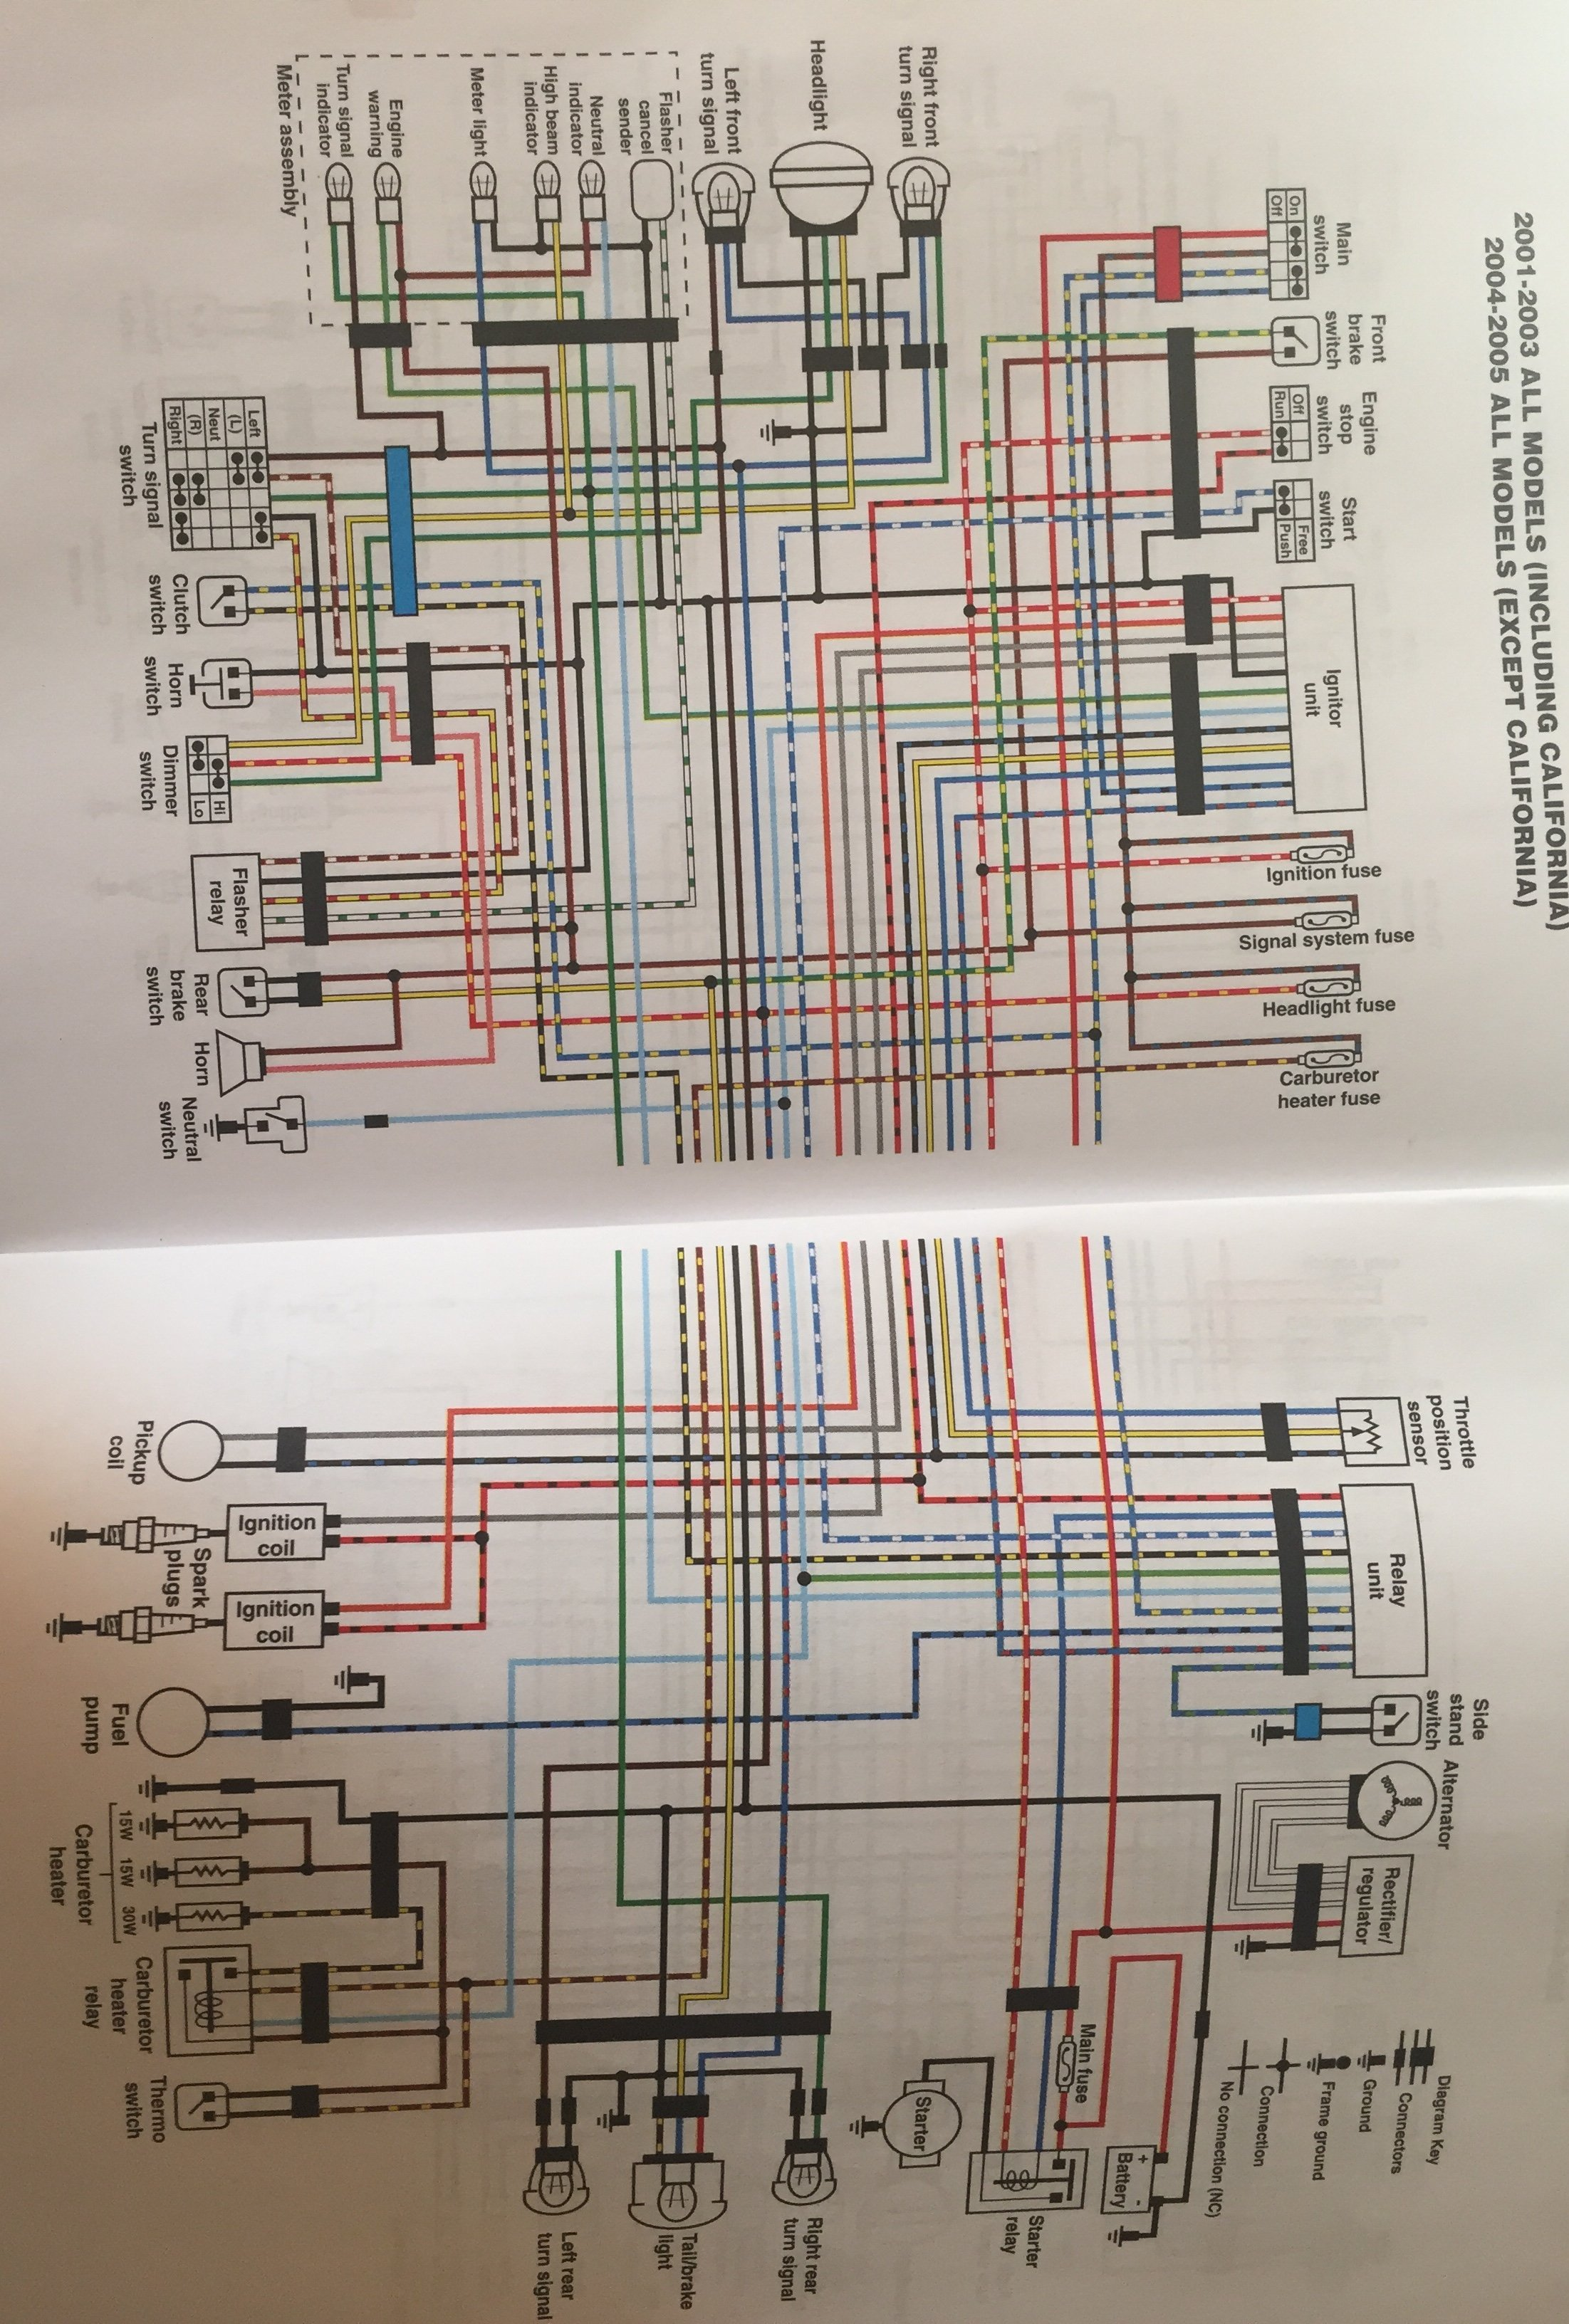 Yamaha V Star 1100 Wiring Diagram Start - Universal Wiring Diagrams layout-data  - layout-data.sceglicongusto.itdiagram database - sceglicongusto.it